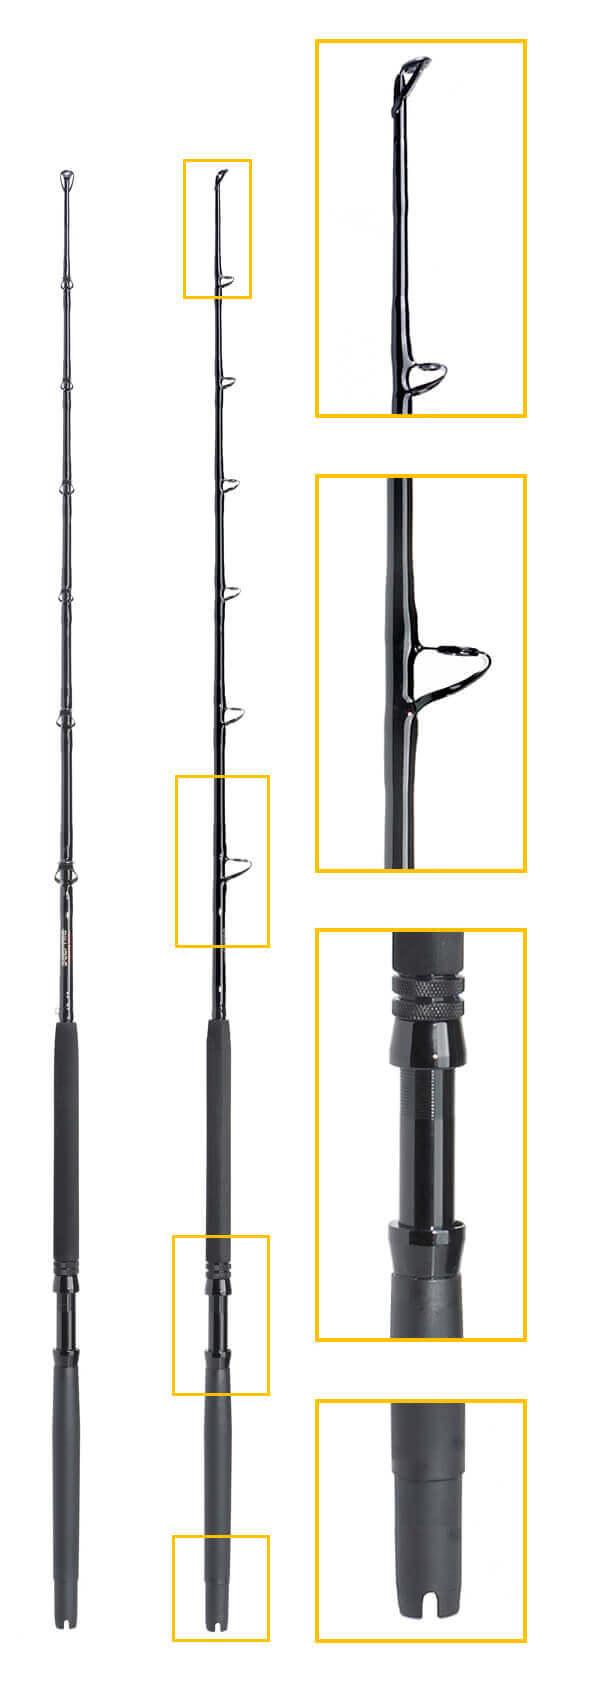 Sceptre 6 FT Standup Rod